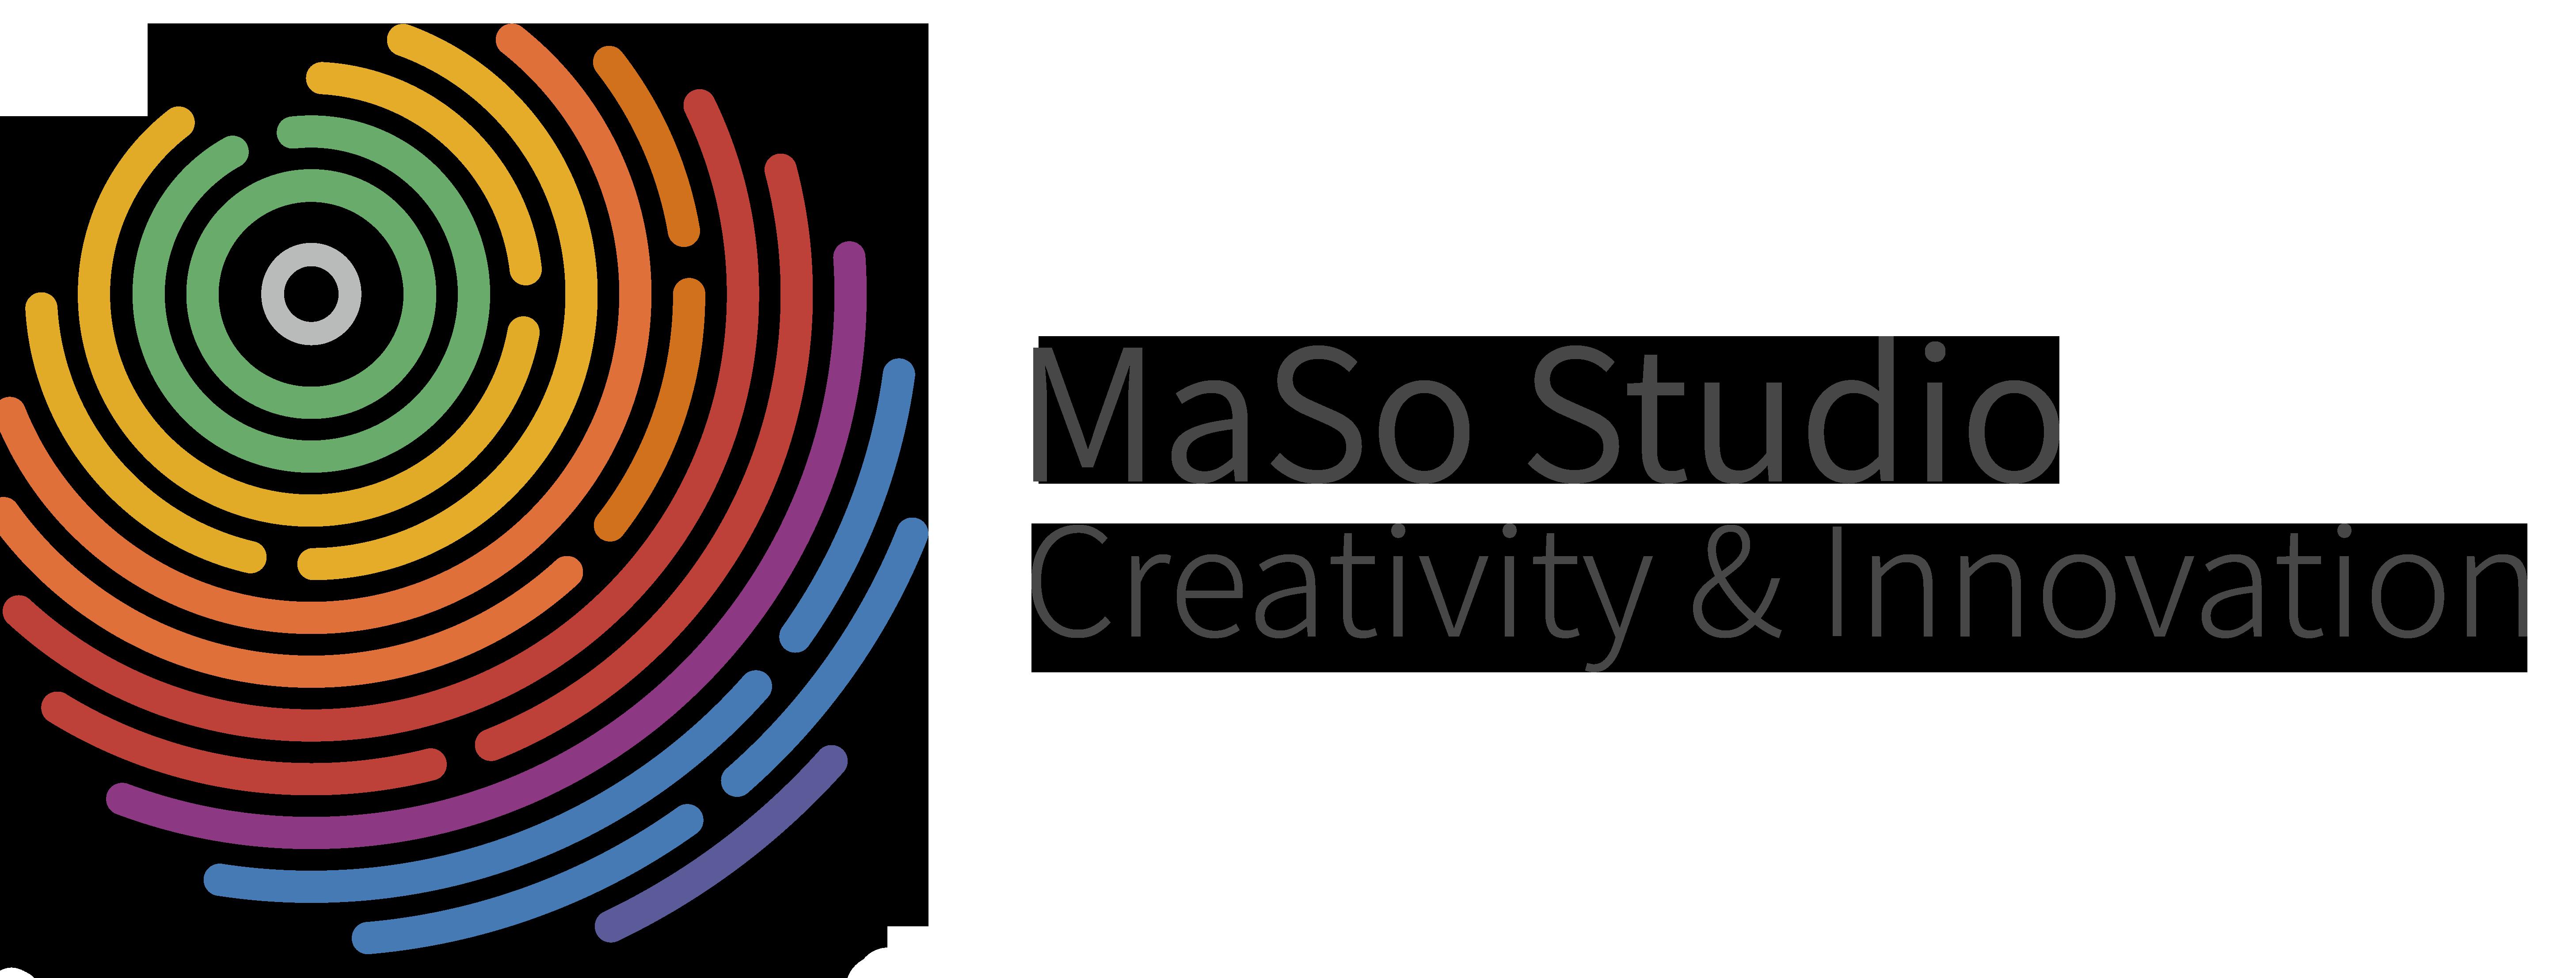 MaSo Studio